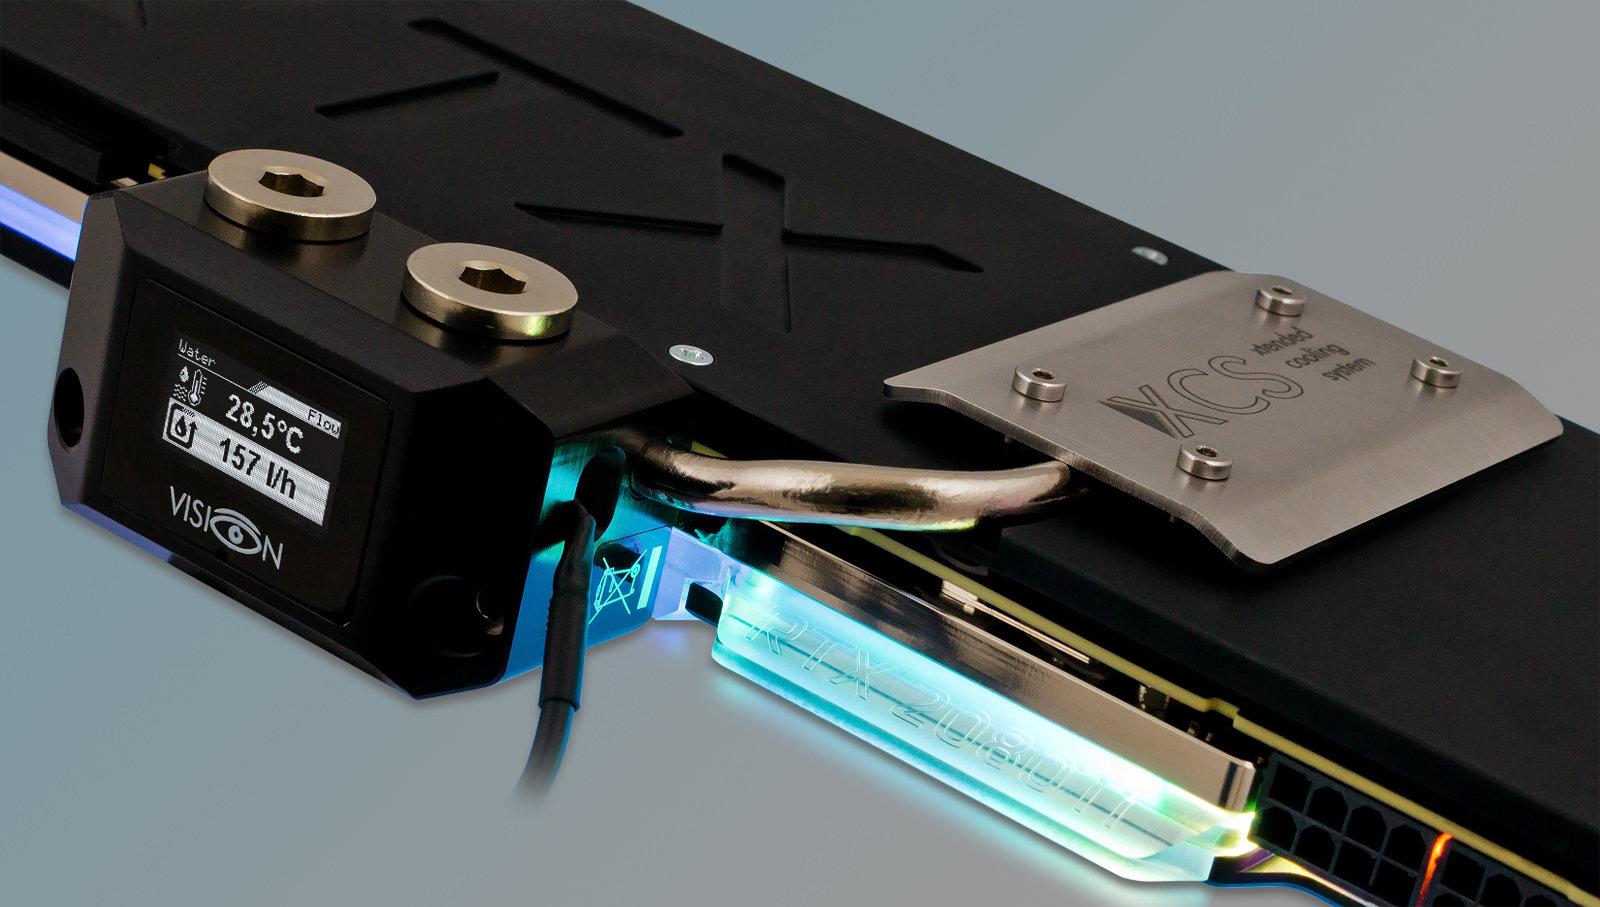 Aqua Computer Kryographics Next RTX 2080 Ti mit Vision-Anschlussterminal